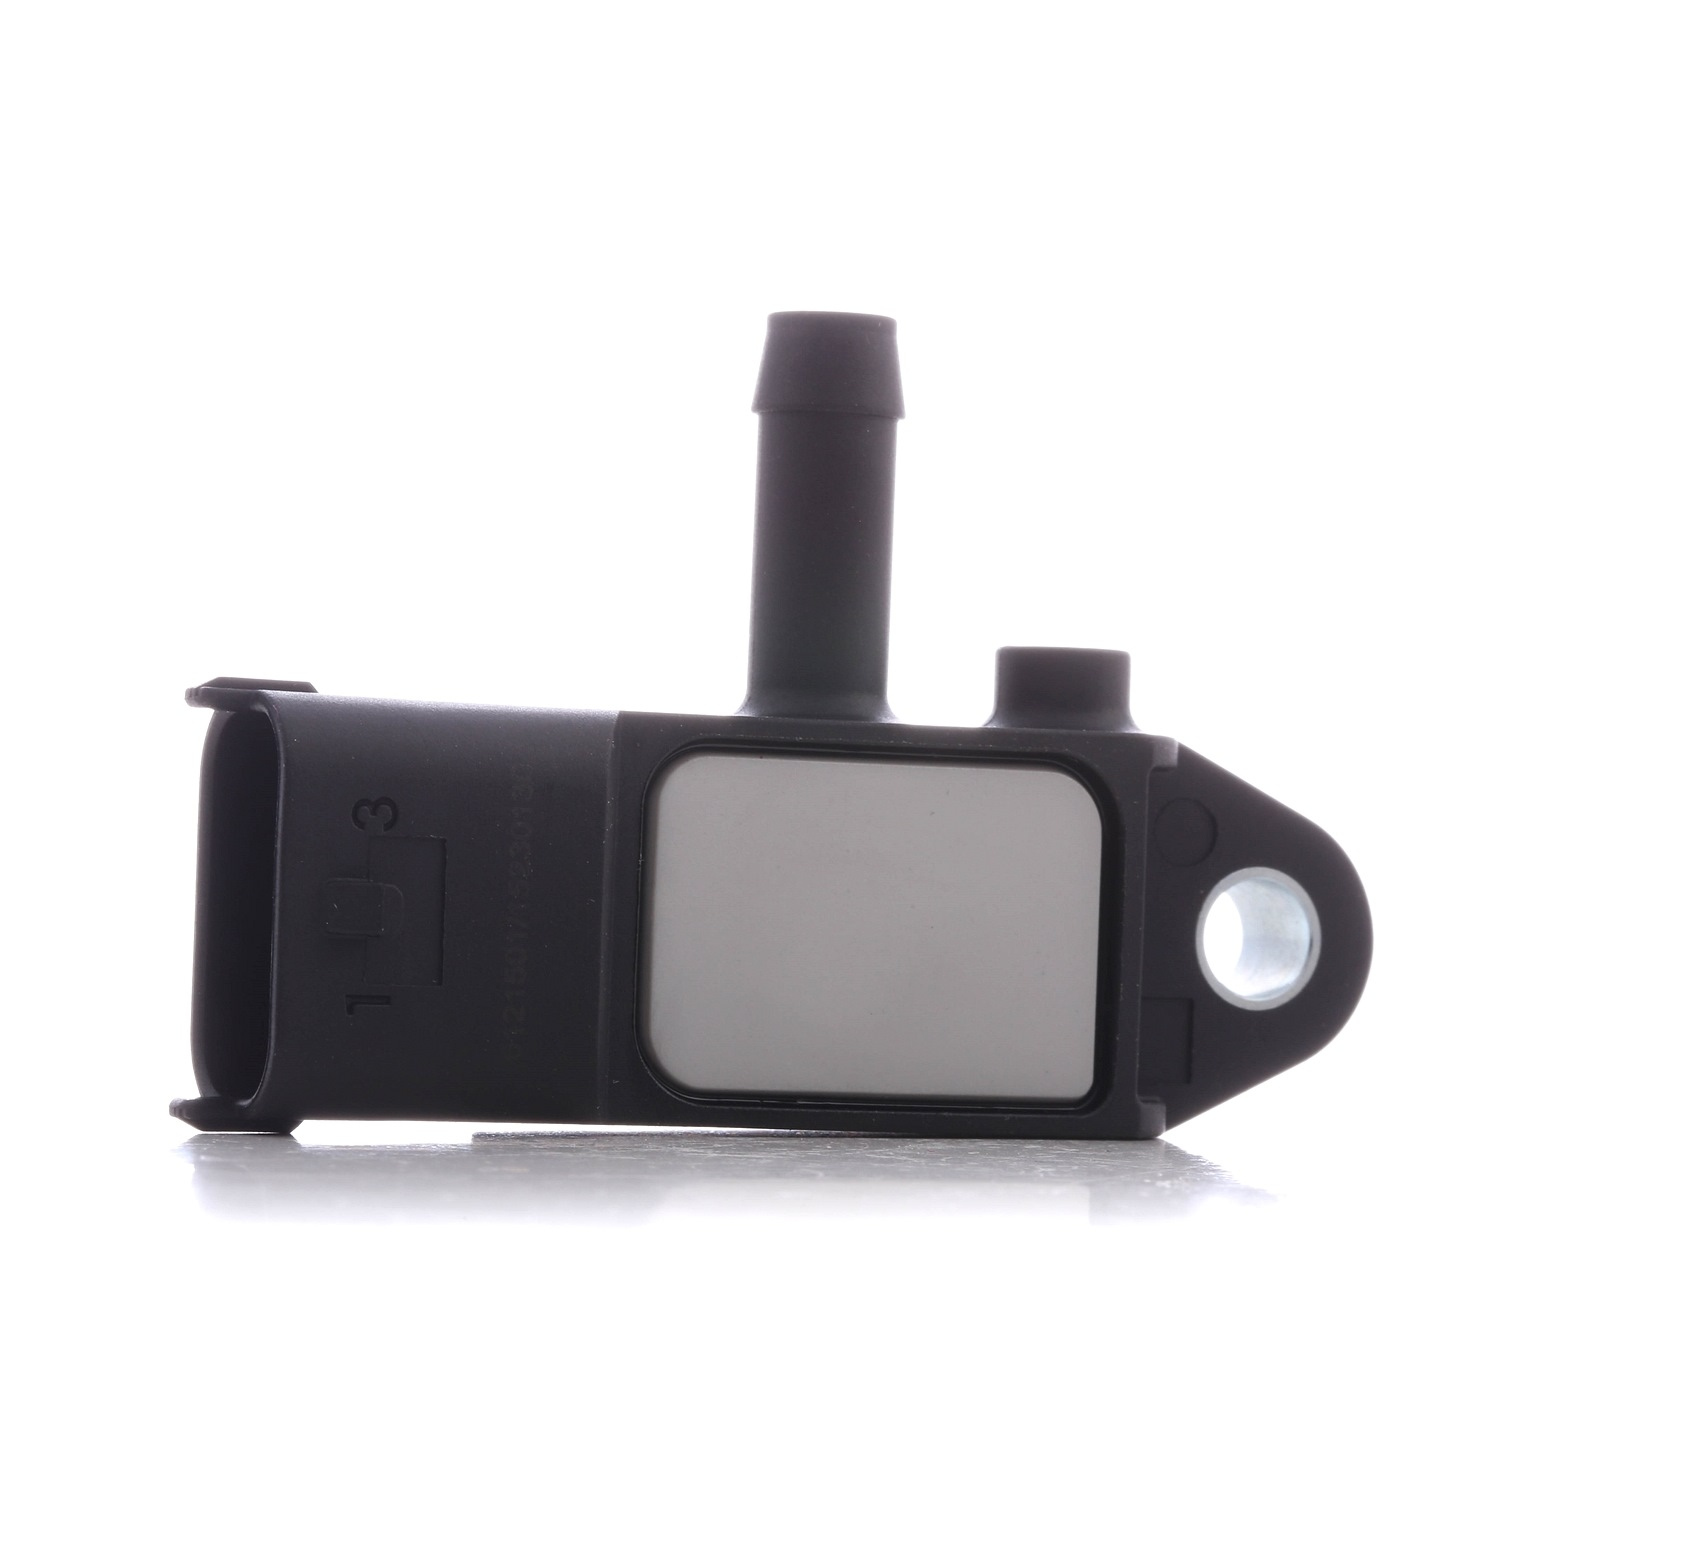 OE Original Abgasdrucksensor SKSEP-1500028 STARK